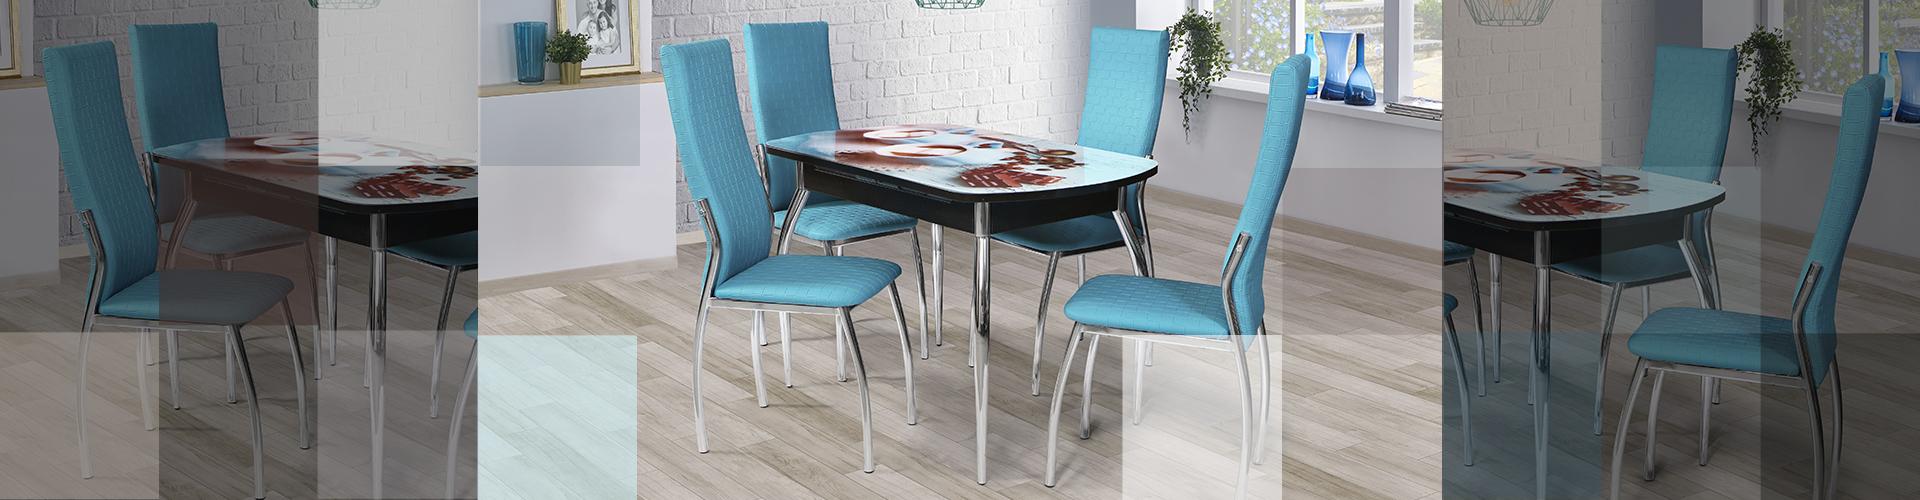 «Glassart-m» мебель от производителя